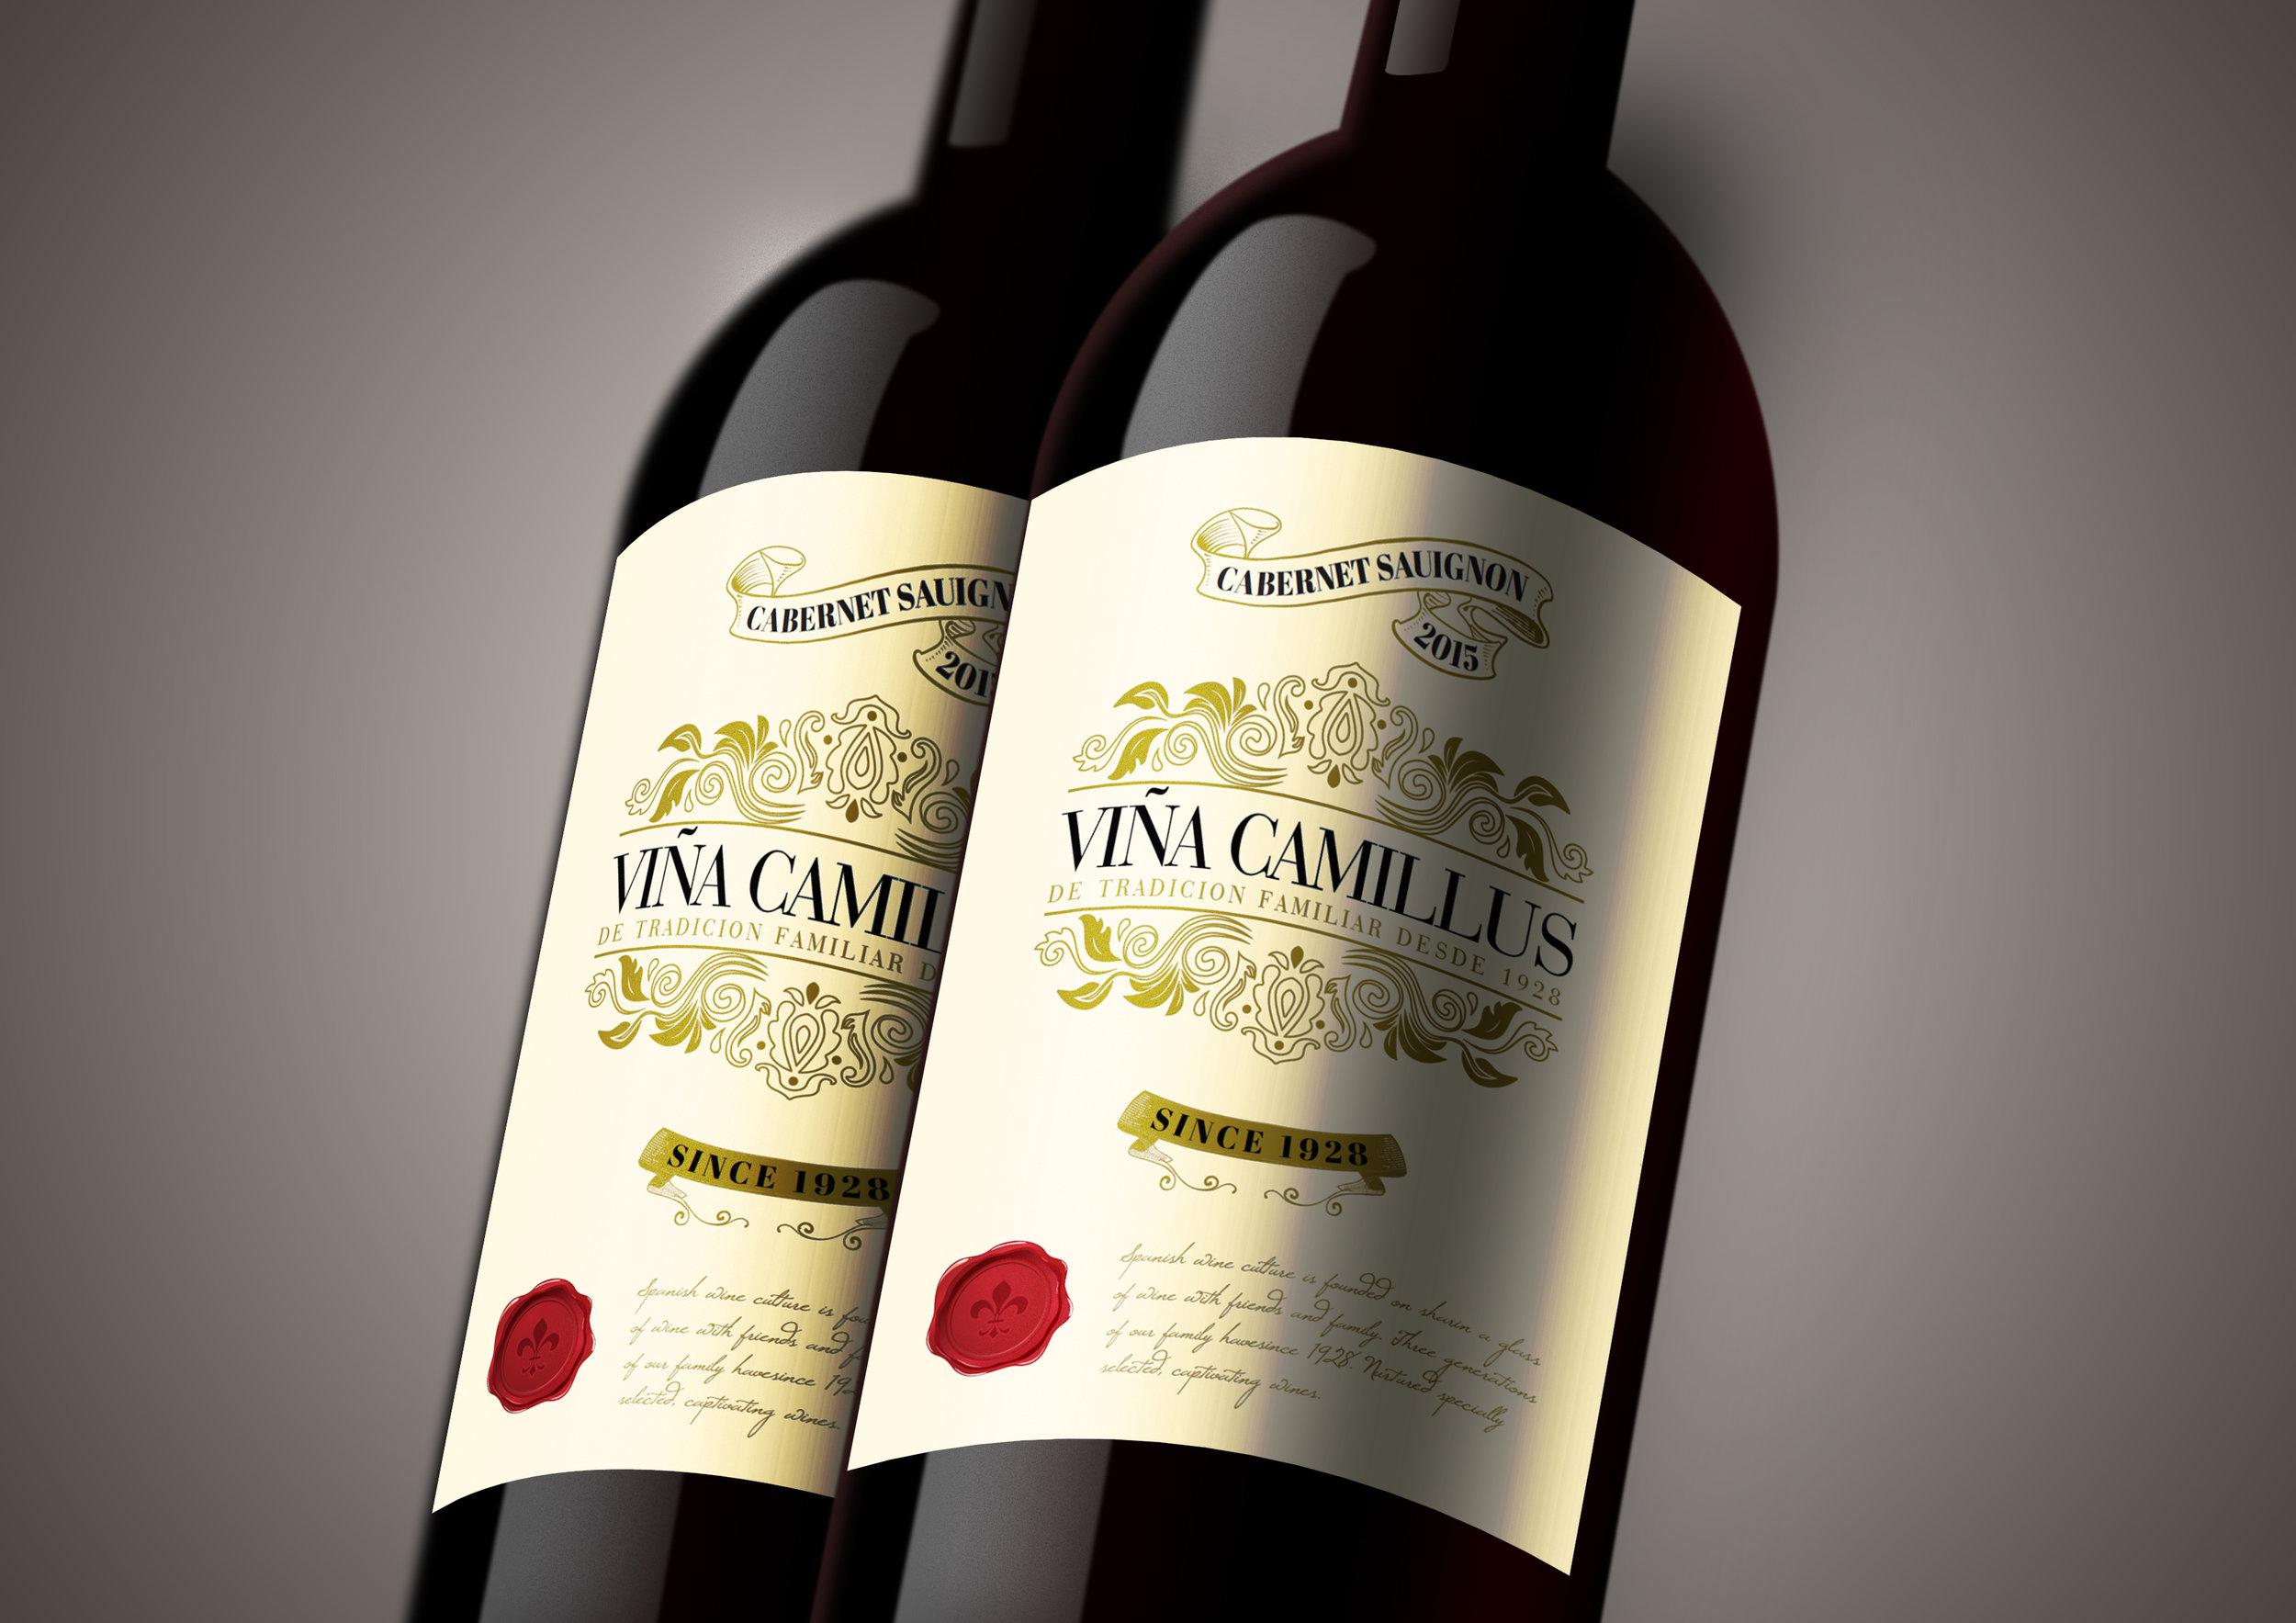 2 Bottle Mock Up Vina Camillus.jpg